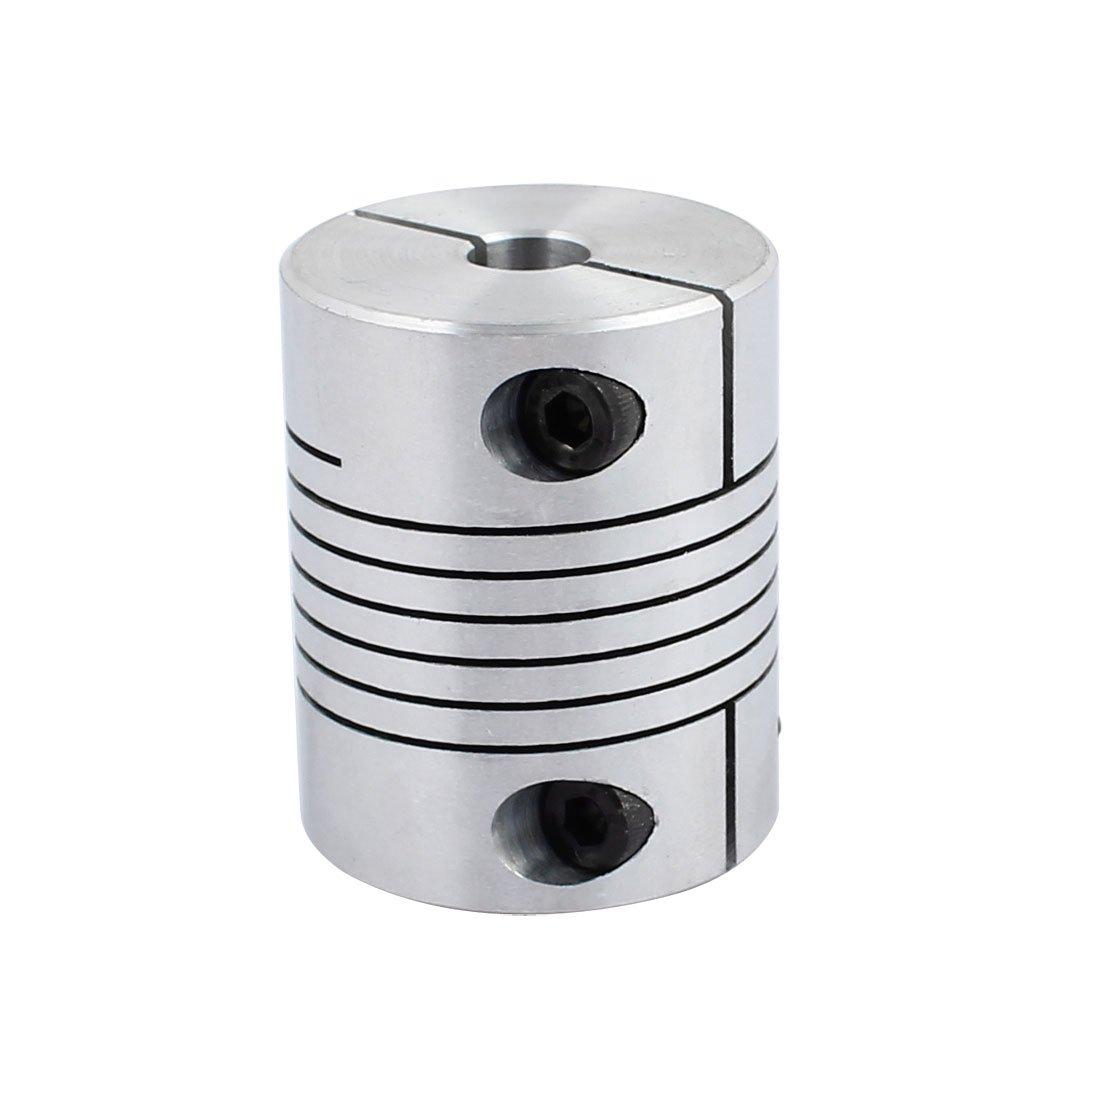 uxcell 8mm to 12mm Shaft Coupling 40mm Length 32mm Diameter Stepper Motor Coupler Aluminum Alloy Joint Connector for 3D Printer CNC Machine DIY Encoder